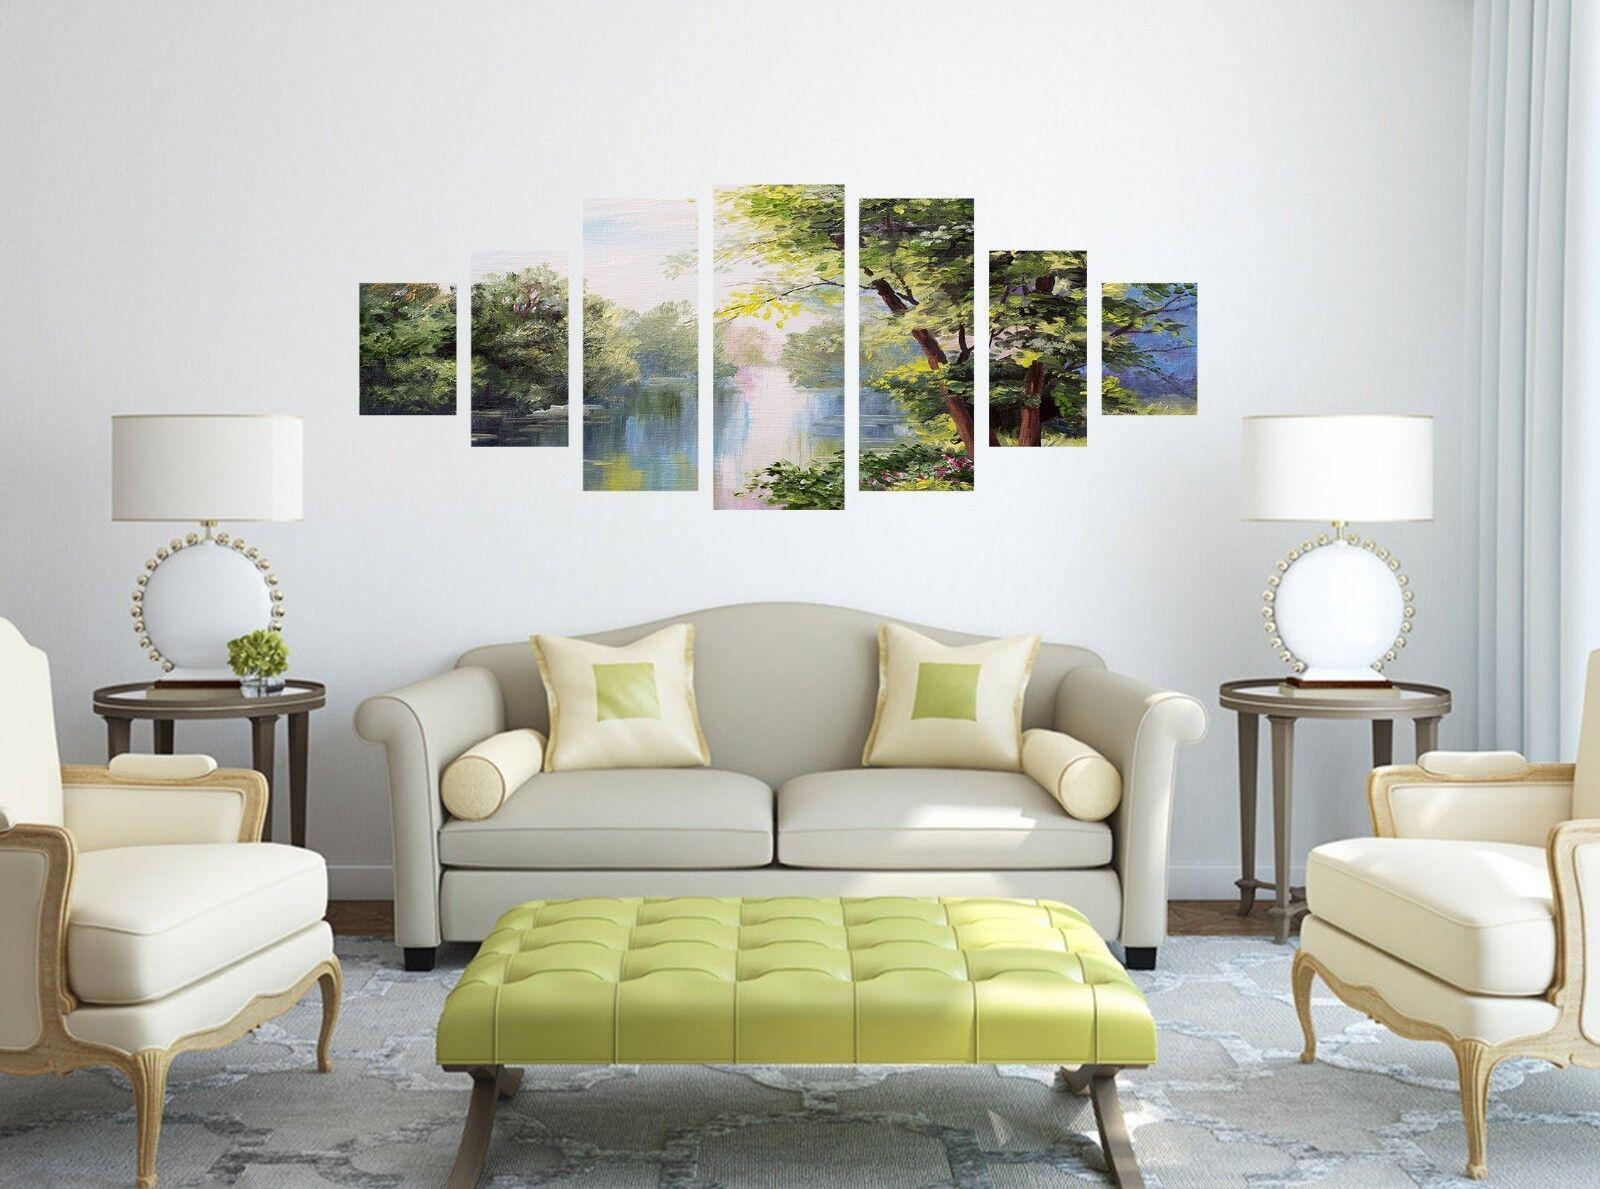 3D Forest 780 Unframed Drucken Wand Papier Decal Wand Deco Innen AJ Wand Jenny